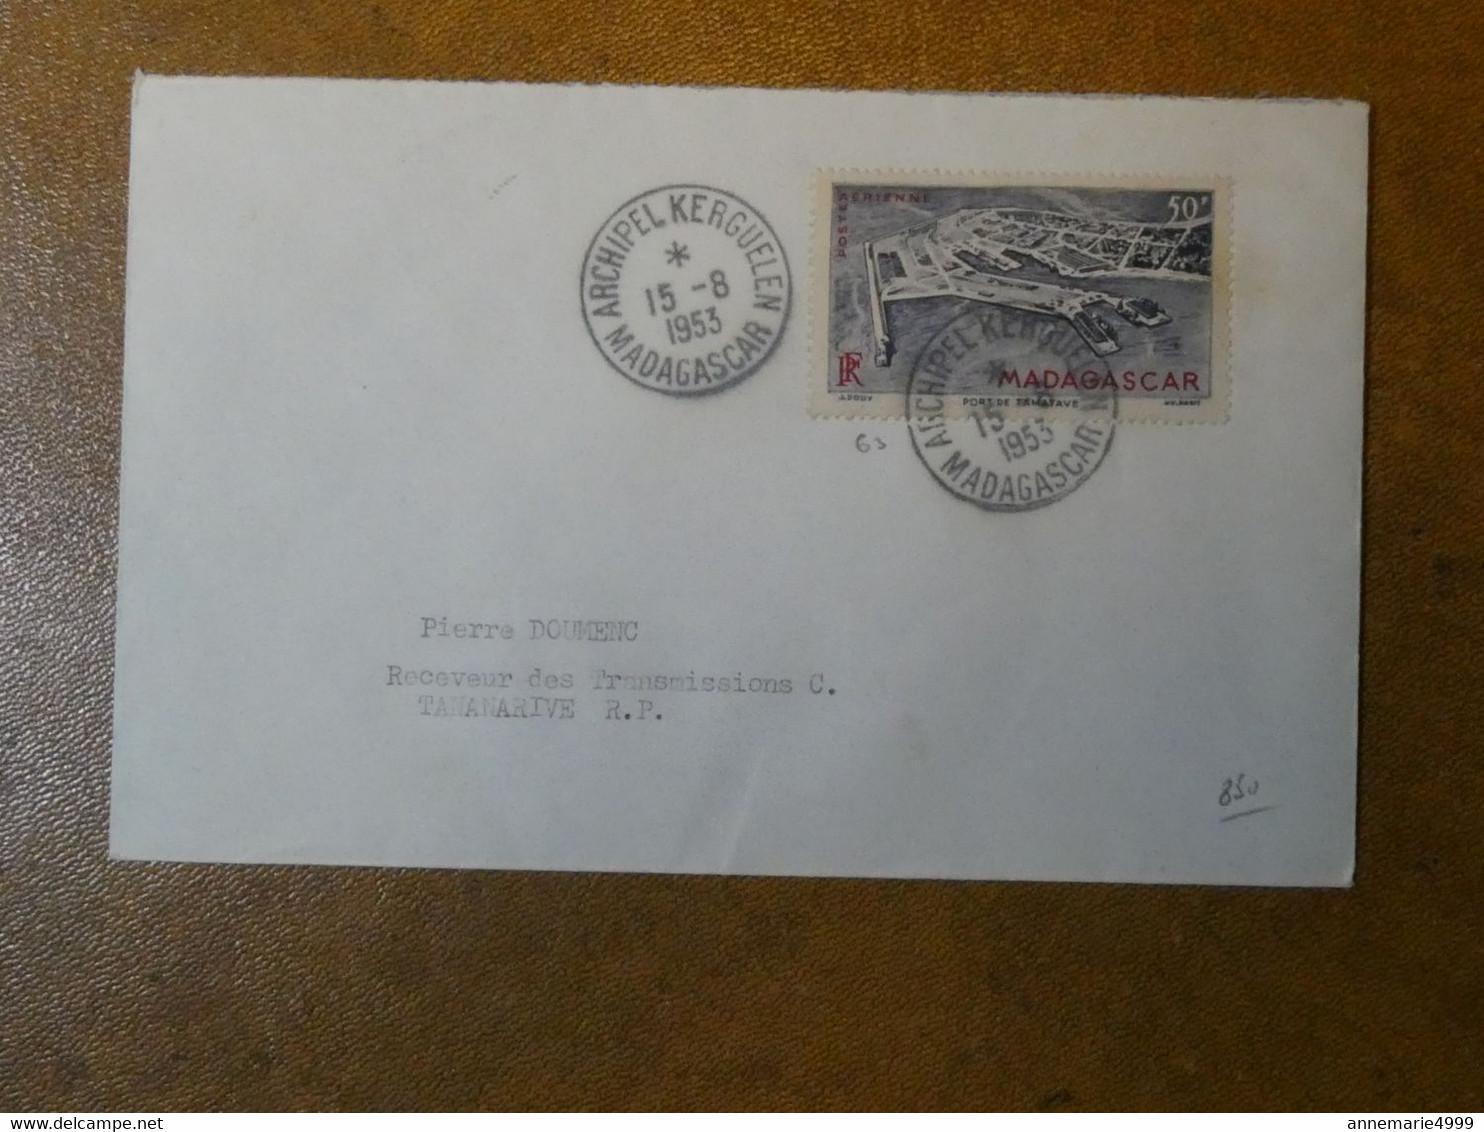 TAAF - MADAGASCAR Archipel Kerguelen  1953 Avec Certificat Voir Scans - ...-1955 Prephilately